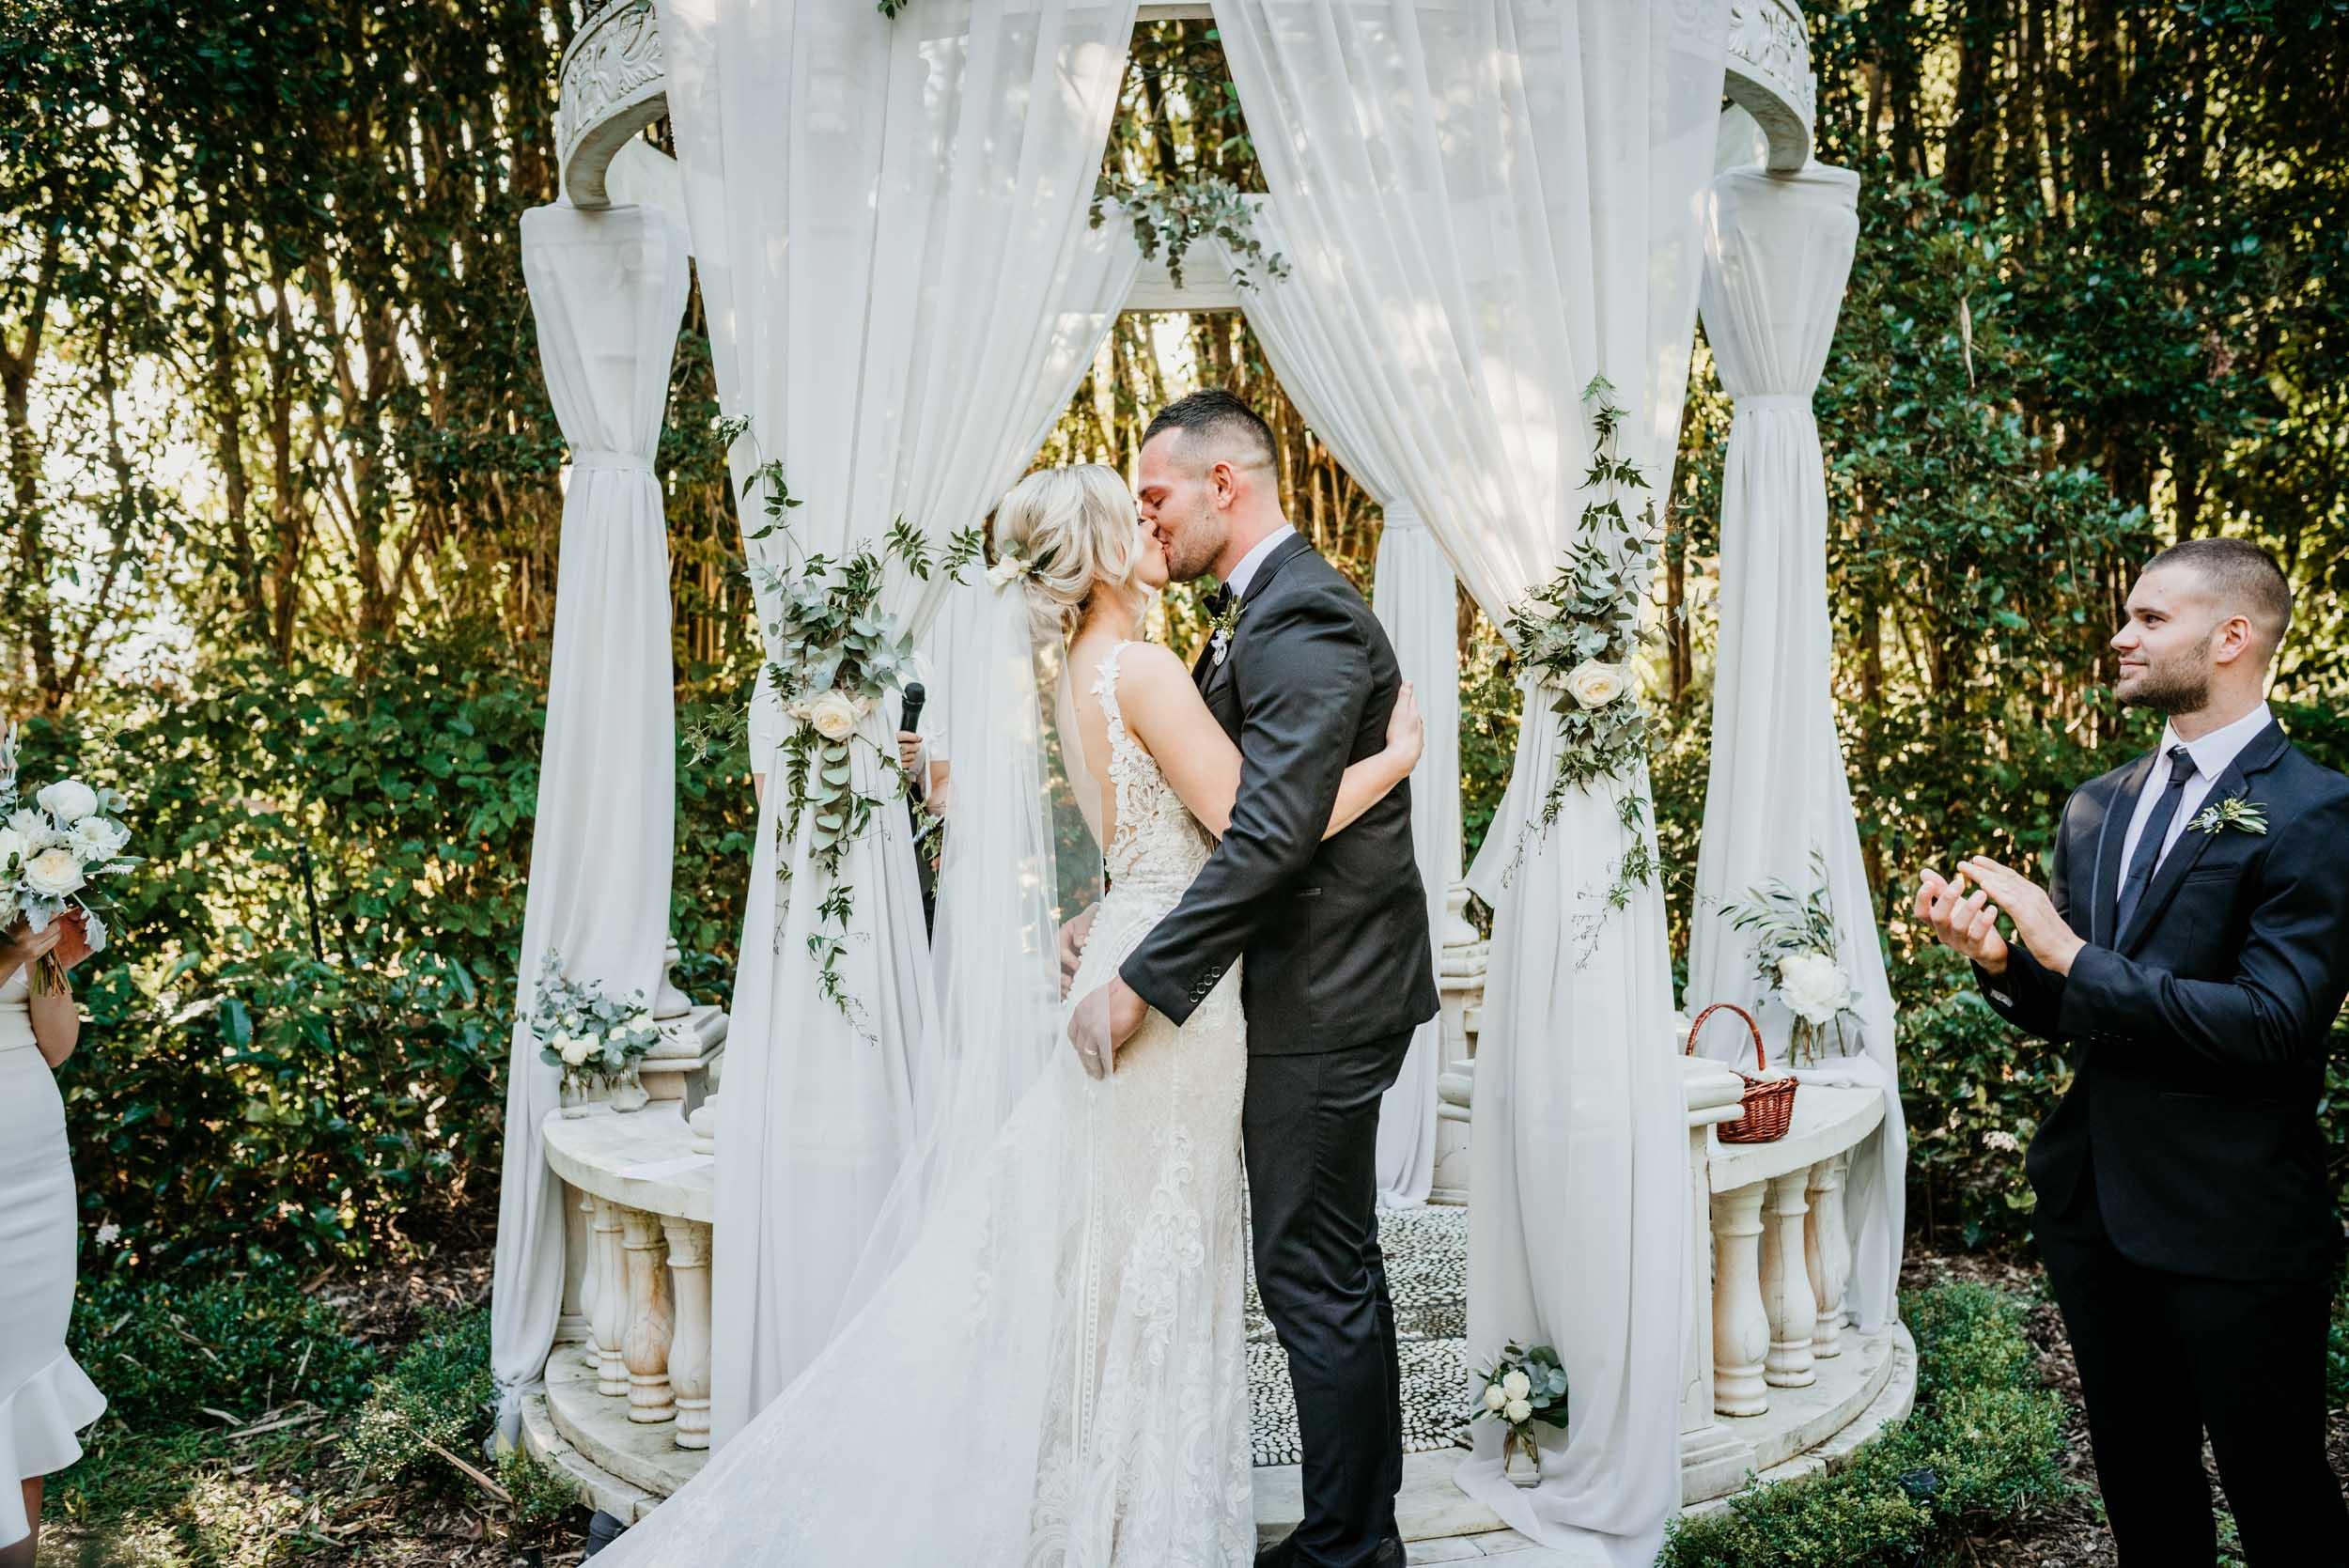 The Raw Photographer - Cairns Wedding Photographer - Laloli - Cairns Garden Wedding - Bride Dress - Destination Wed - Outdoor Reception - Queensland Ceremony-32.jpg